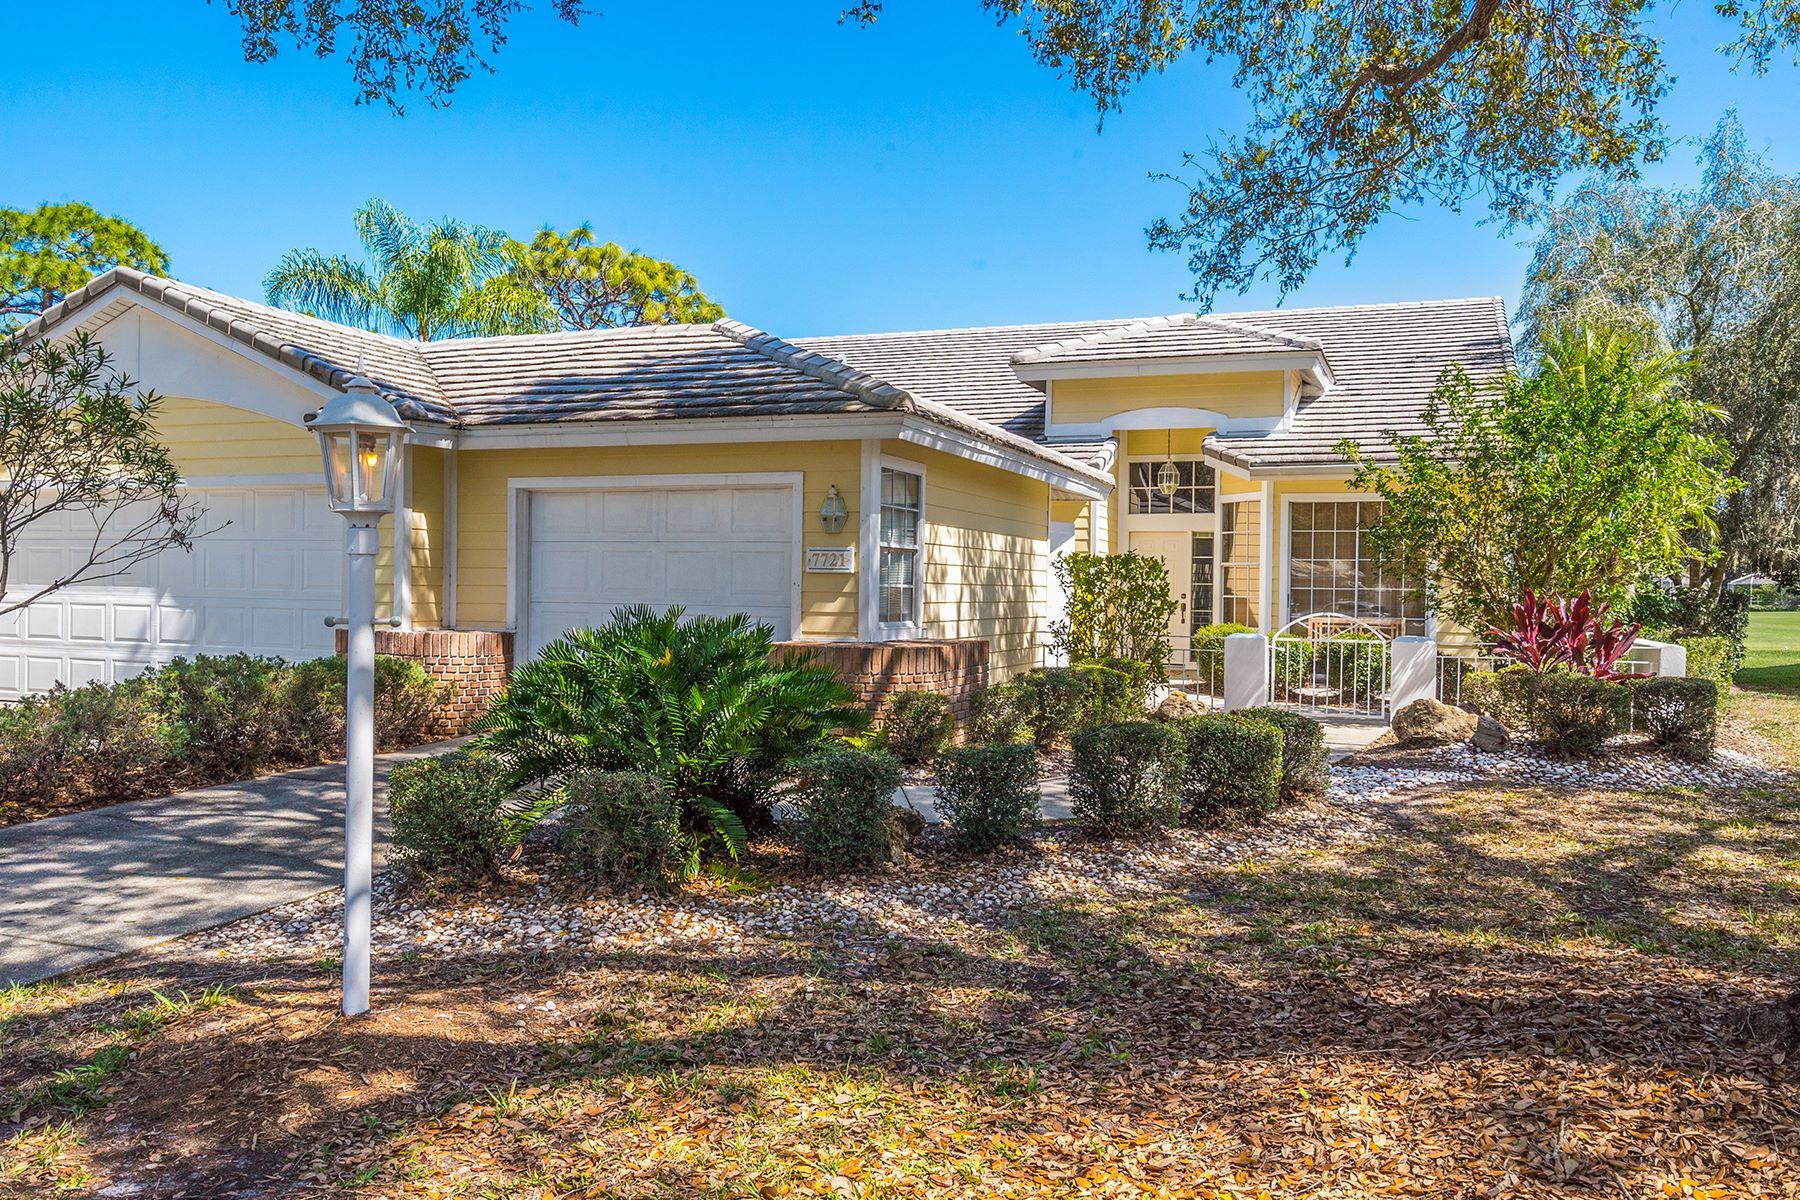 Single Family Home for Sale at UNIVERSITY PARK COUNTRY CLUB 7721 Whitebridge University Park, Florida, 34201 United States